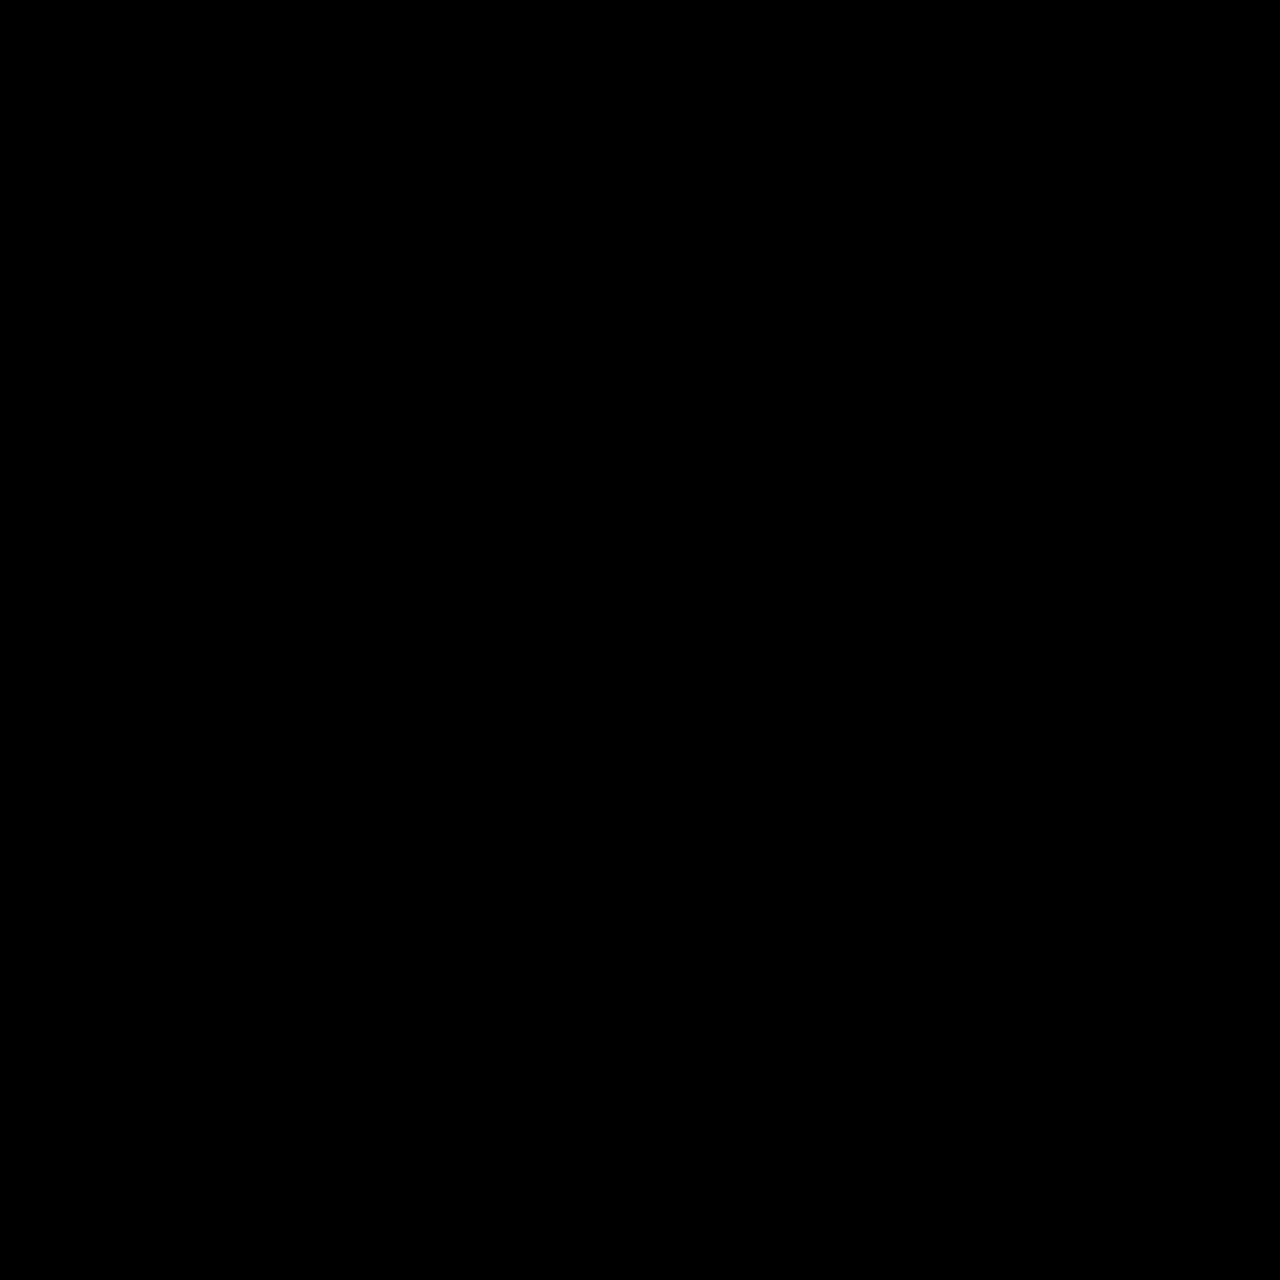 Star Wars Rebel Alliance Logo. source: Wikipedia